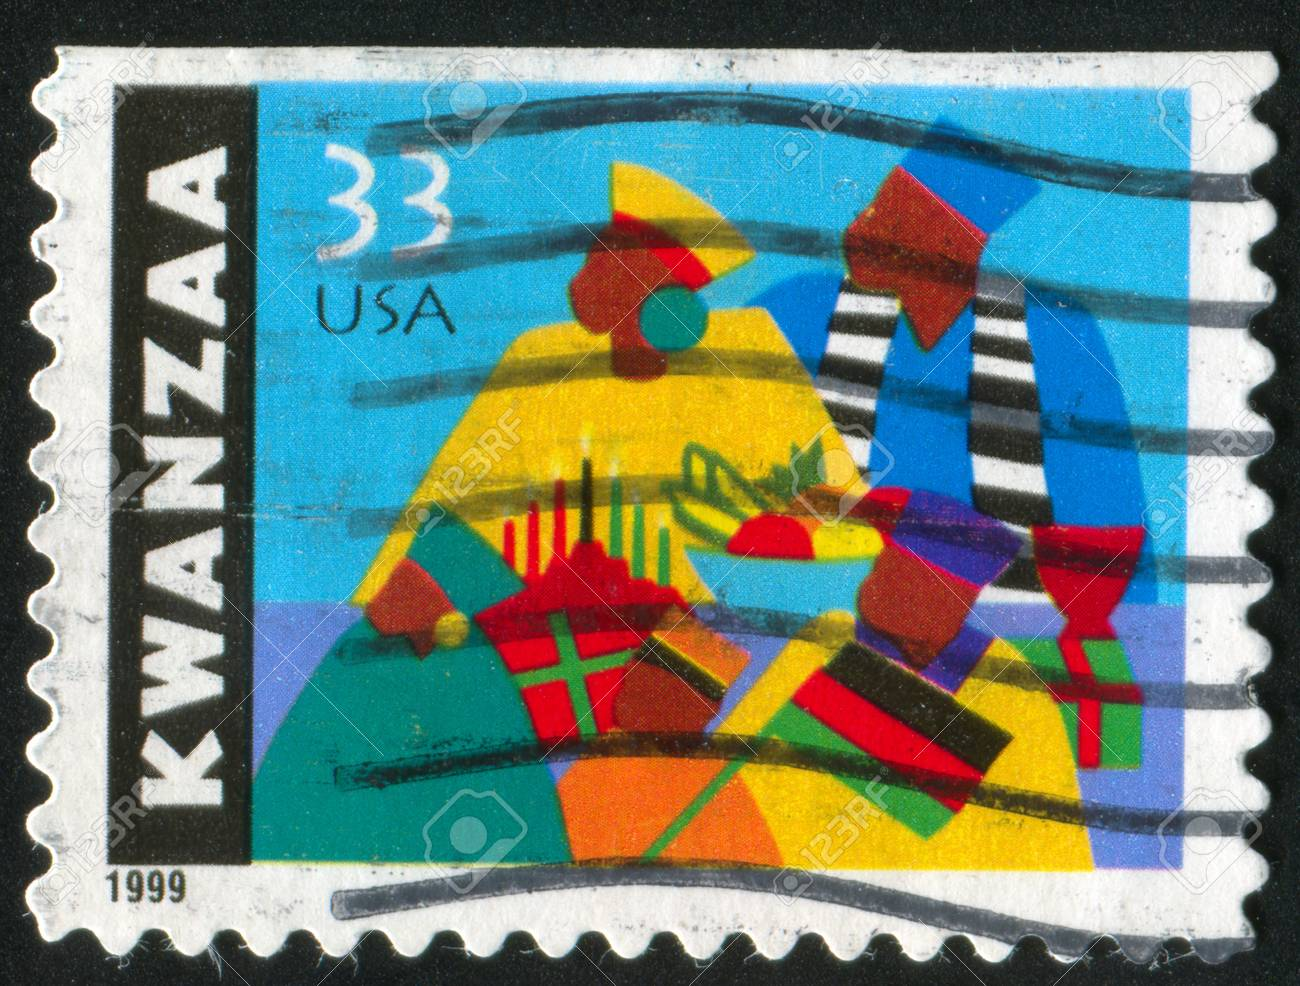 UNITED STATES - CIRCA 1999: stamp printed by United States of America, shows Kwanzaa celebration, circa 1999 Stock Photo - 11371364